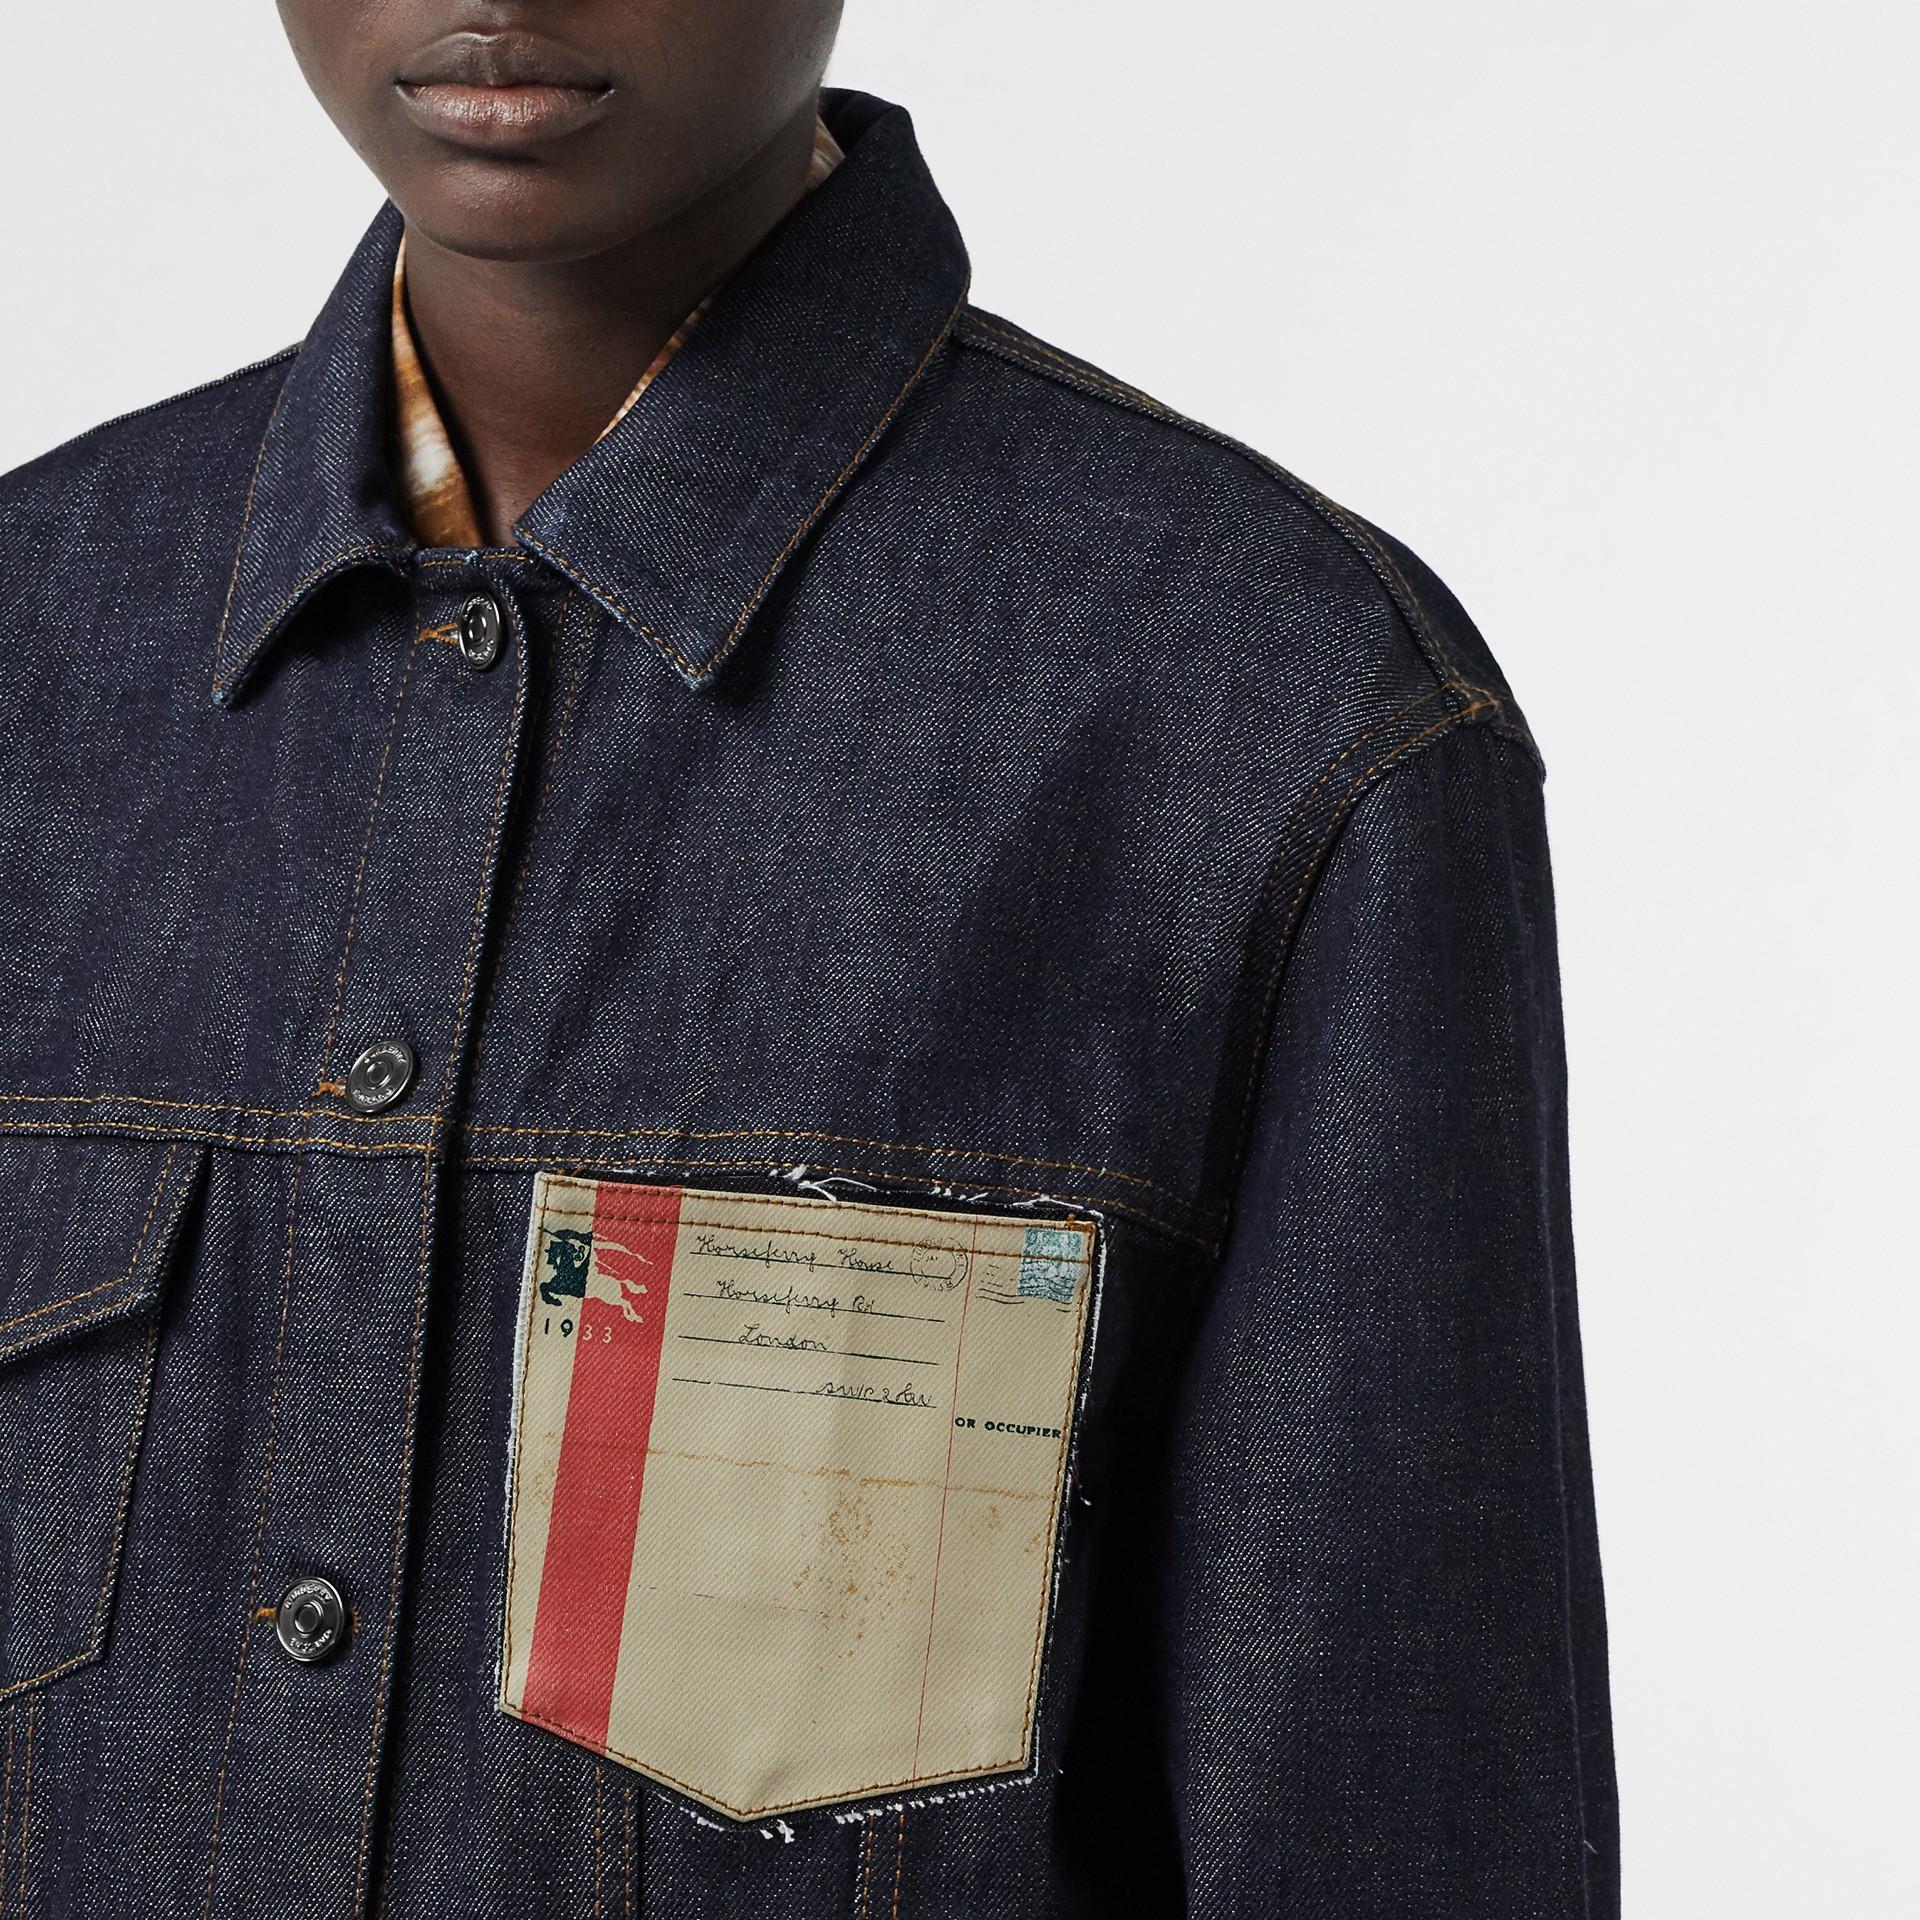 Postcard Motif Japanese Selvedge Denim Jacket in Indigo - Women | Burberry United States - gallery image 1